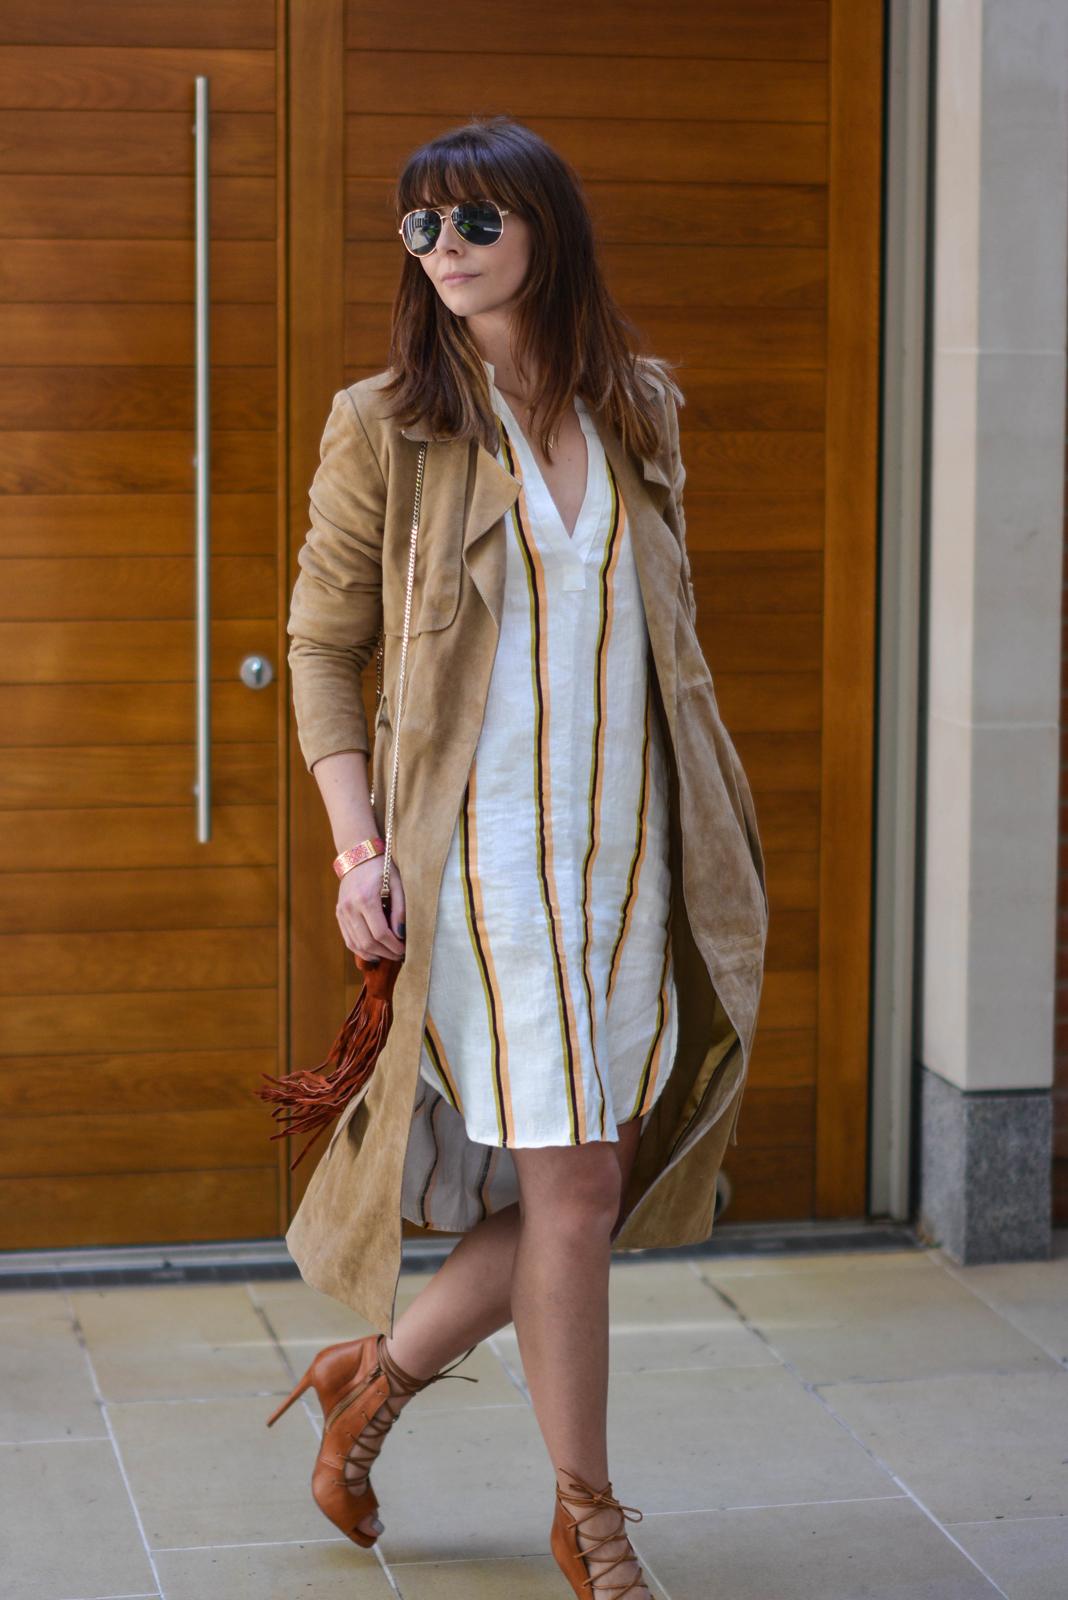 EJSTYLE - Emma Hill wear H&M linen stripe shirt dress, Gestuz suede trench coat, tan lace up heels, Karen Millen suded fringe bag, OOTD